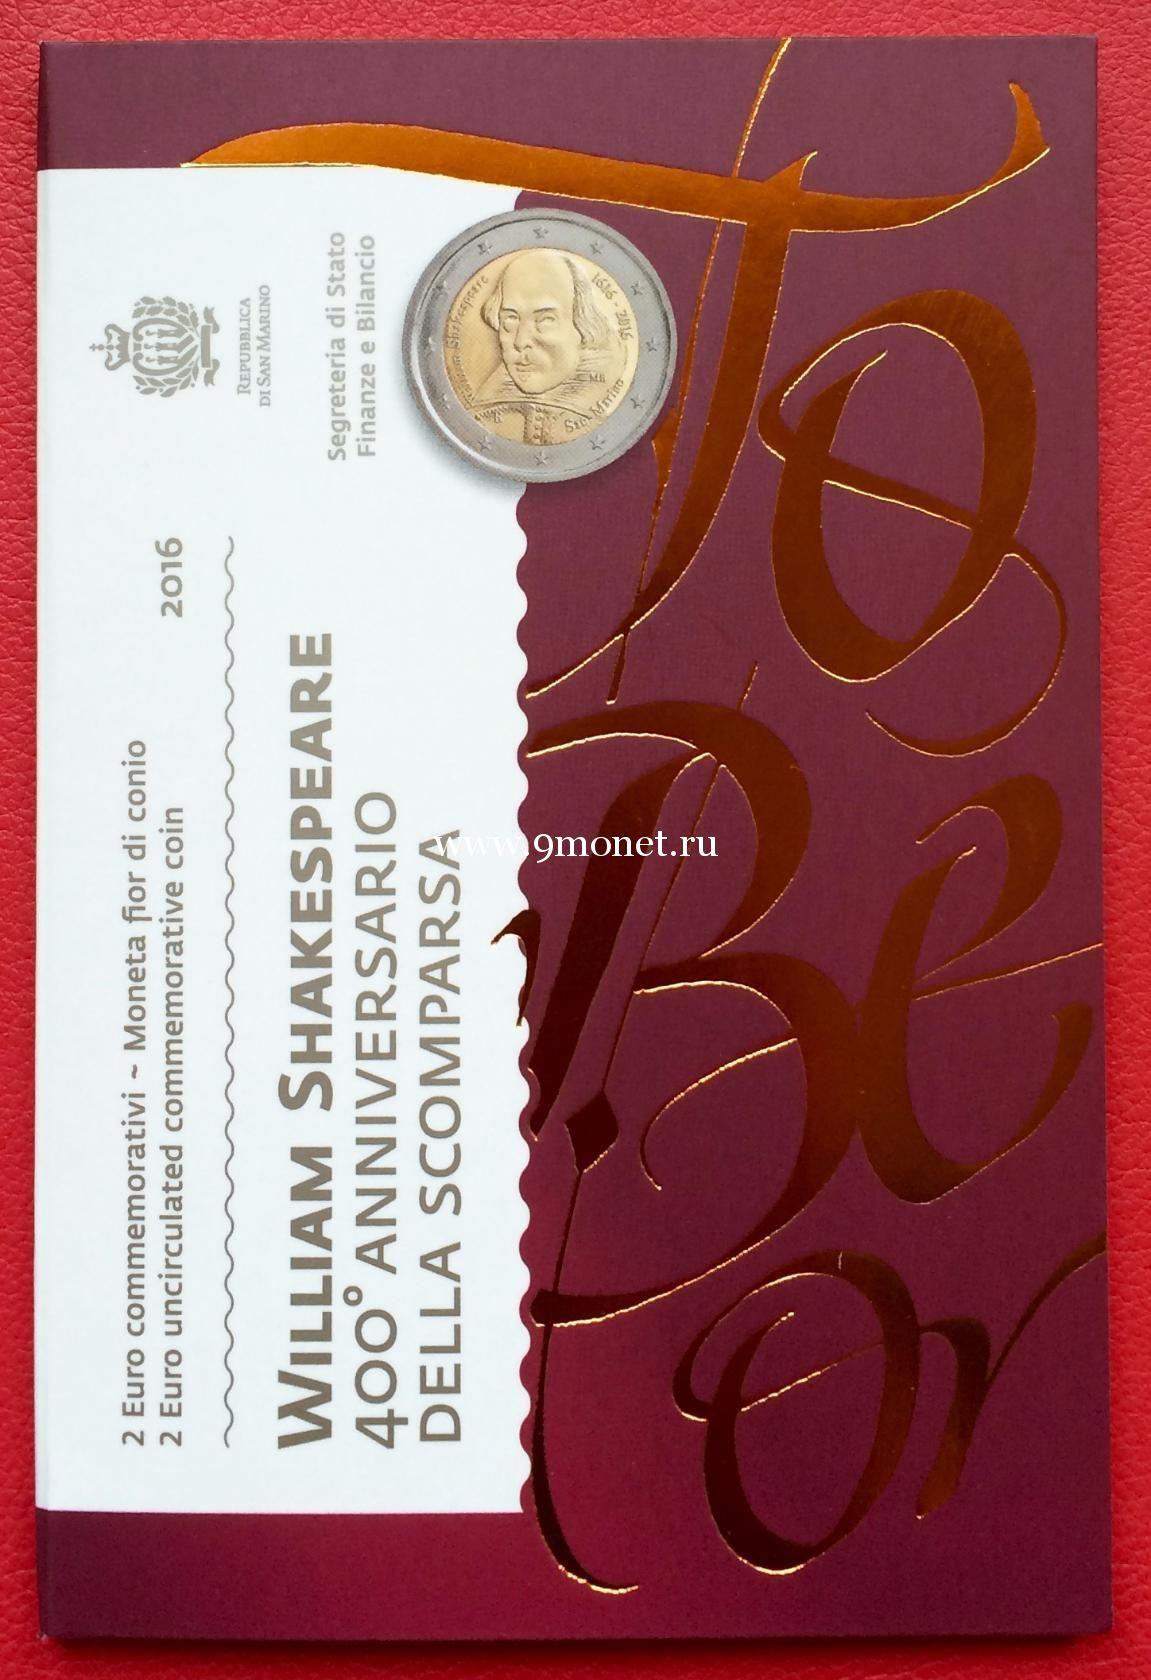 2016 год. Сан-Марино. Монета 2 евро. 400 лет со дня смерти Уильяма Шекспира.